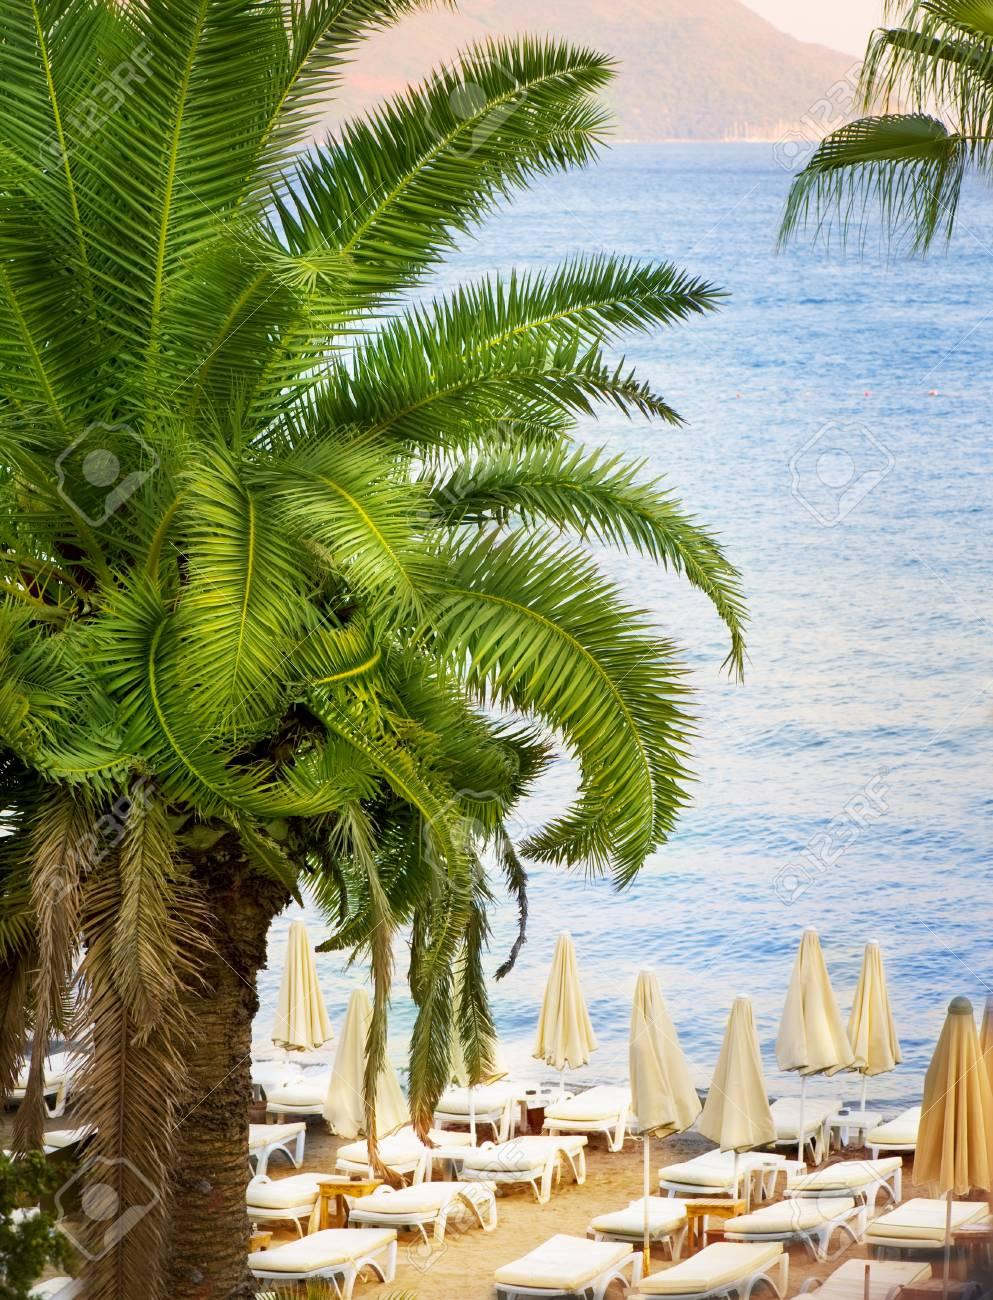 Tropical Resort Stock Photo - 10689023